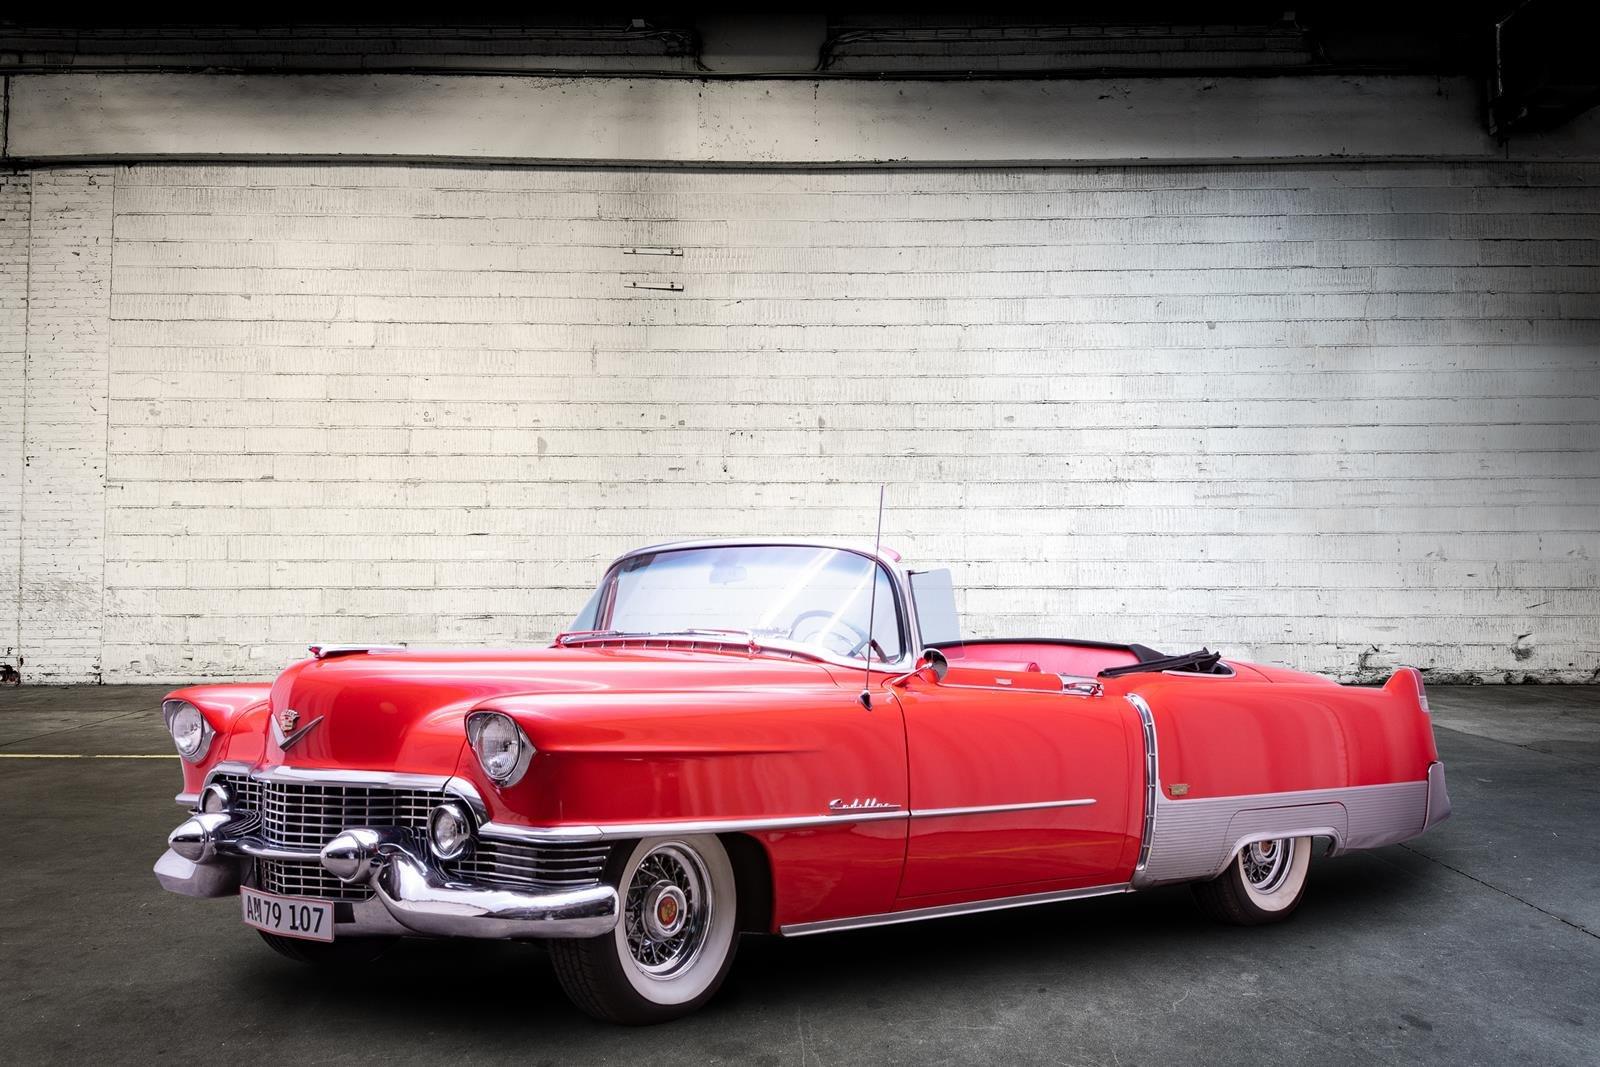 Cadillac Eldorado Convertible 6,5L 1954 For Sale (picture 1 of 6)